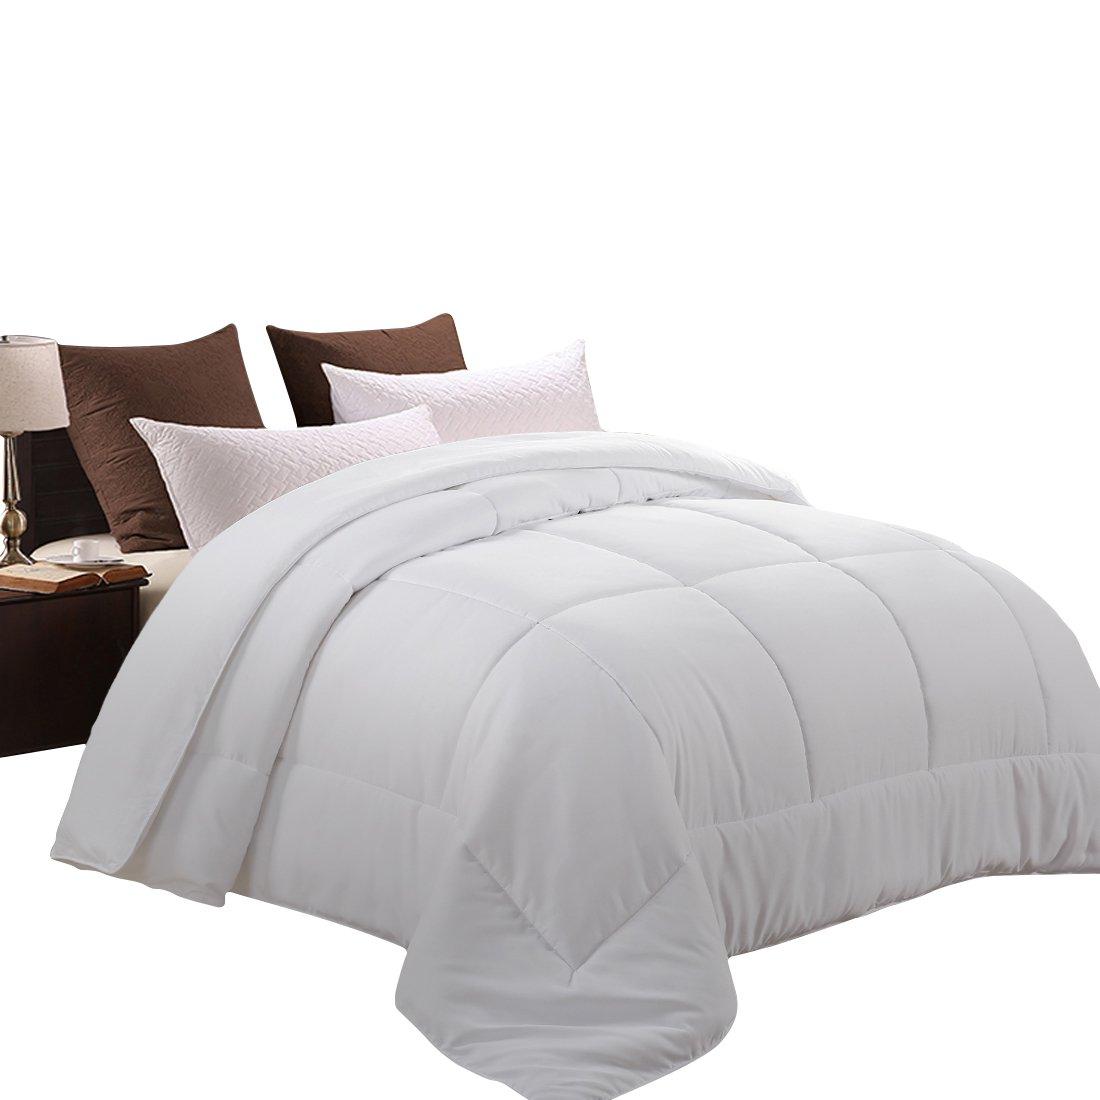 MEROUS Queen Comforter Duvet Insert White- Soft Goose Down Alternative Quilted Warm Comforter,Hypoallergenic and Lightweight Luxury Hotel Collection